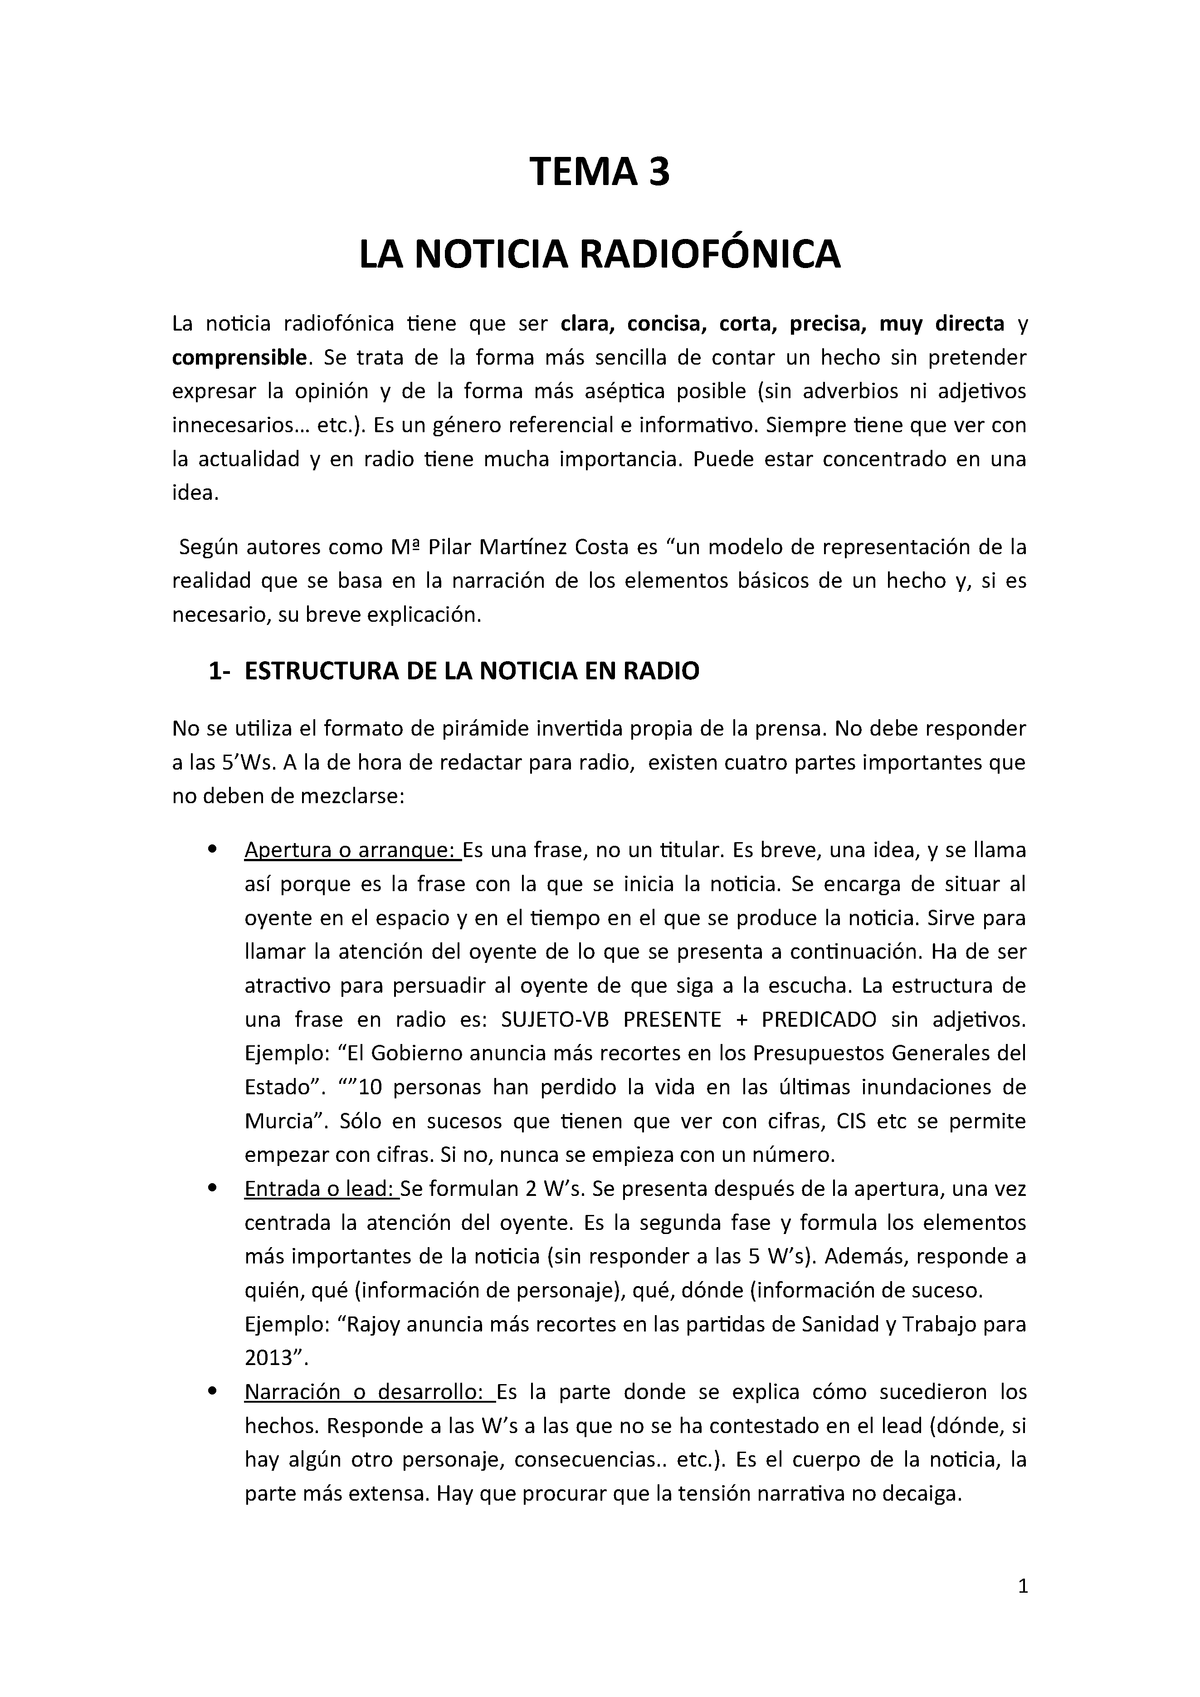 Apuntes Temas 3 4 Radio Informativa 41341 Uva Studocu